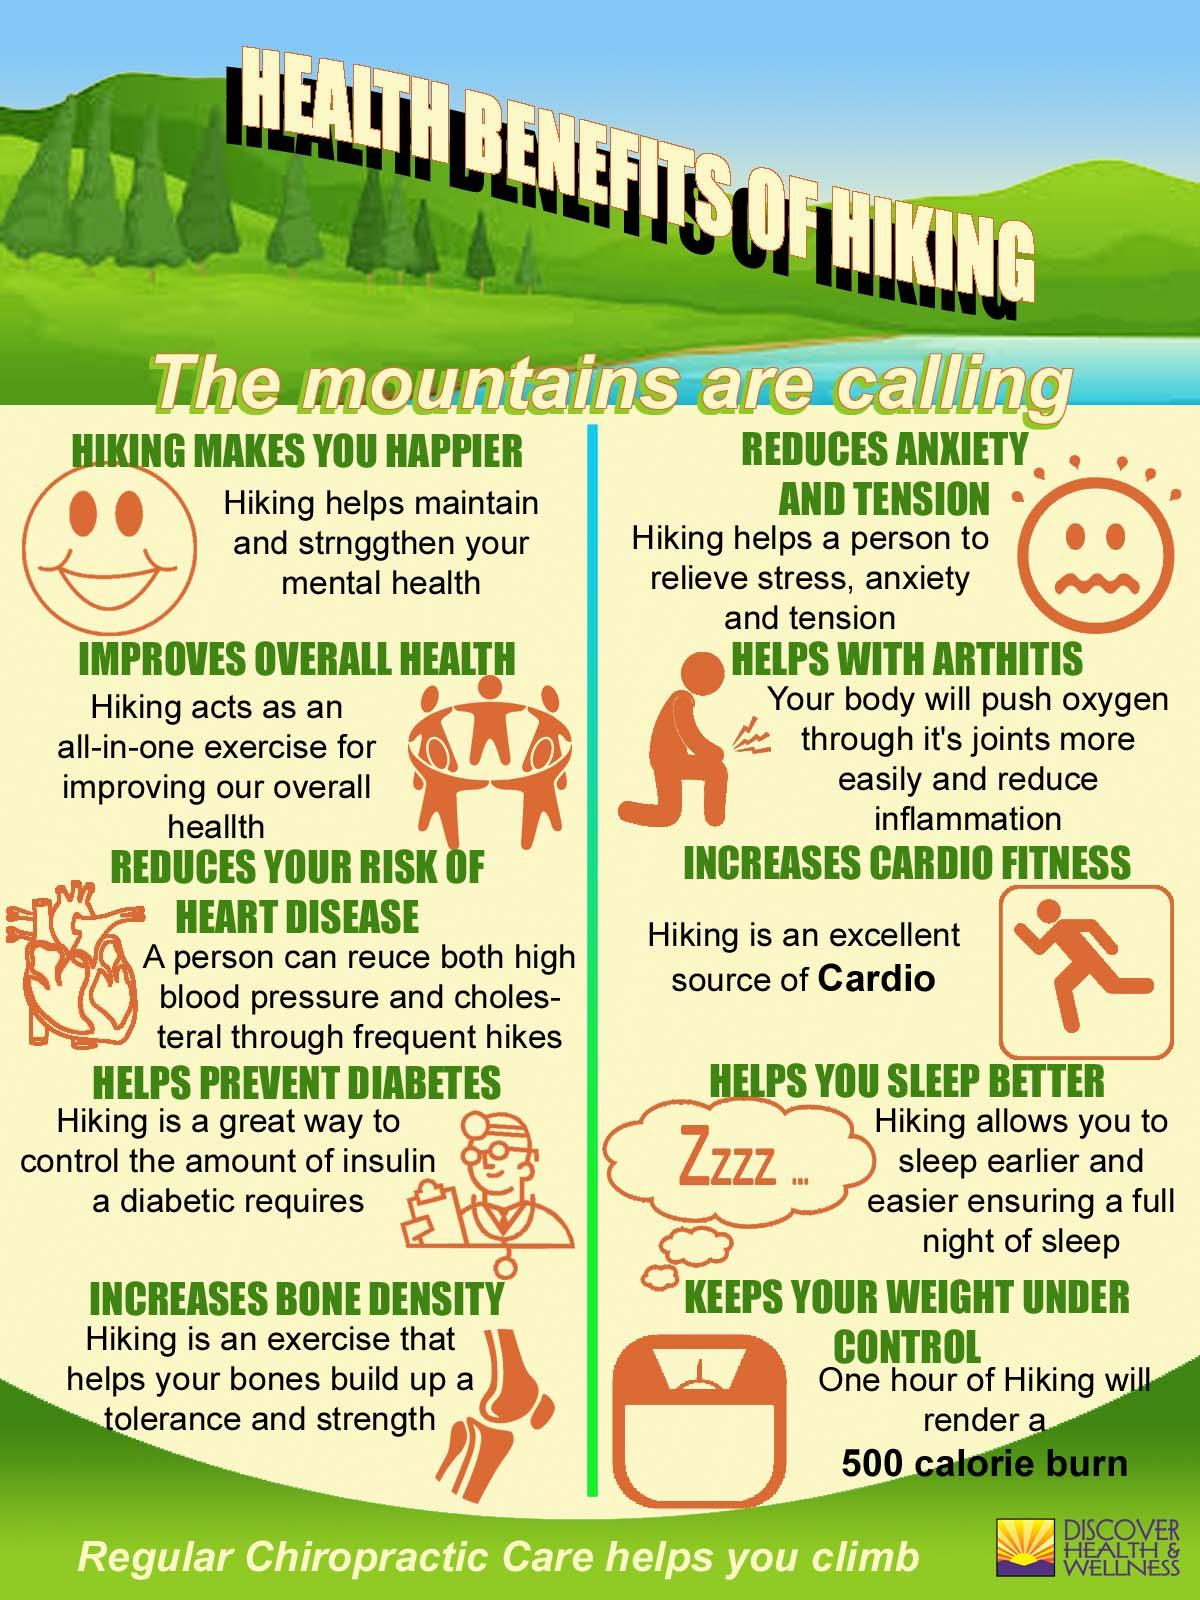 denver-colorado-chiropractic-hiking-health-benefits-infographic